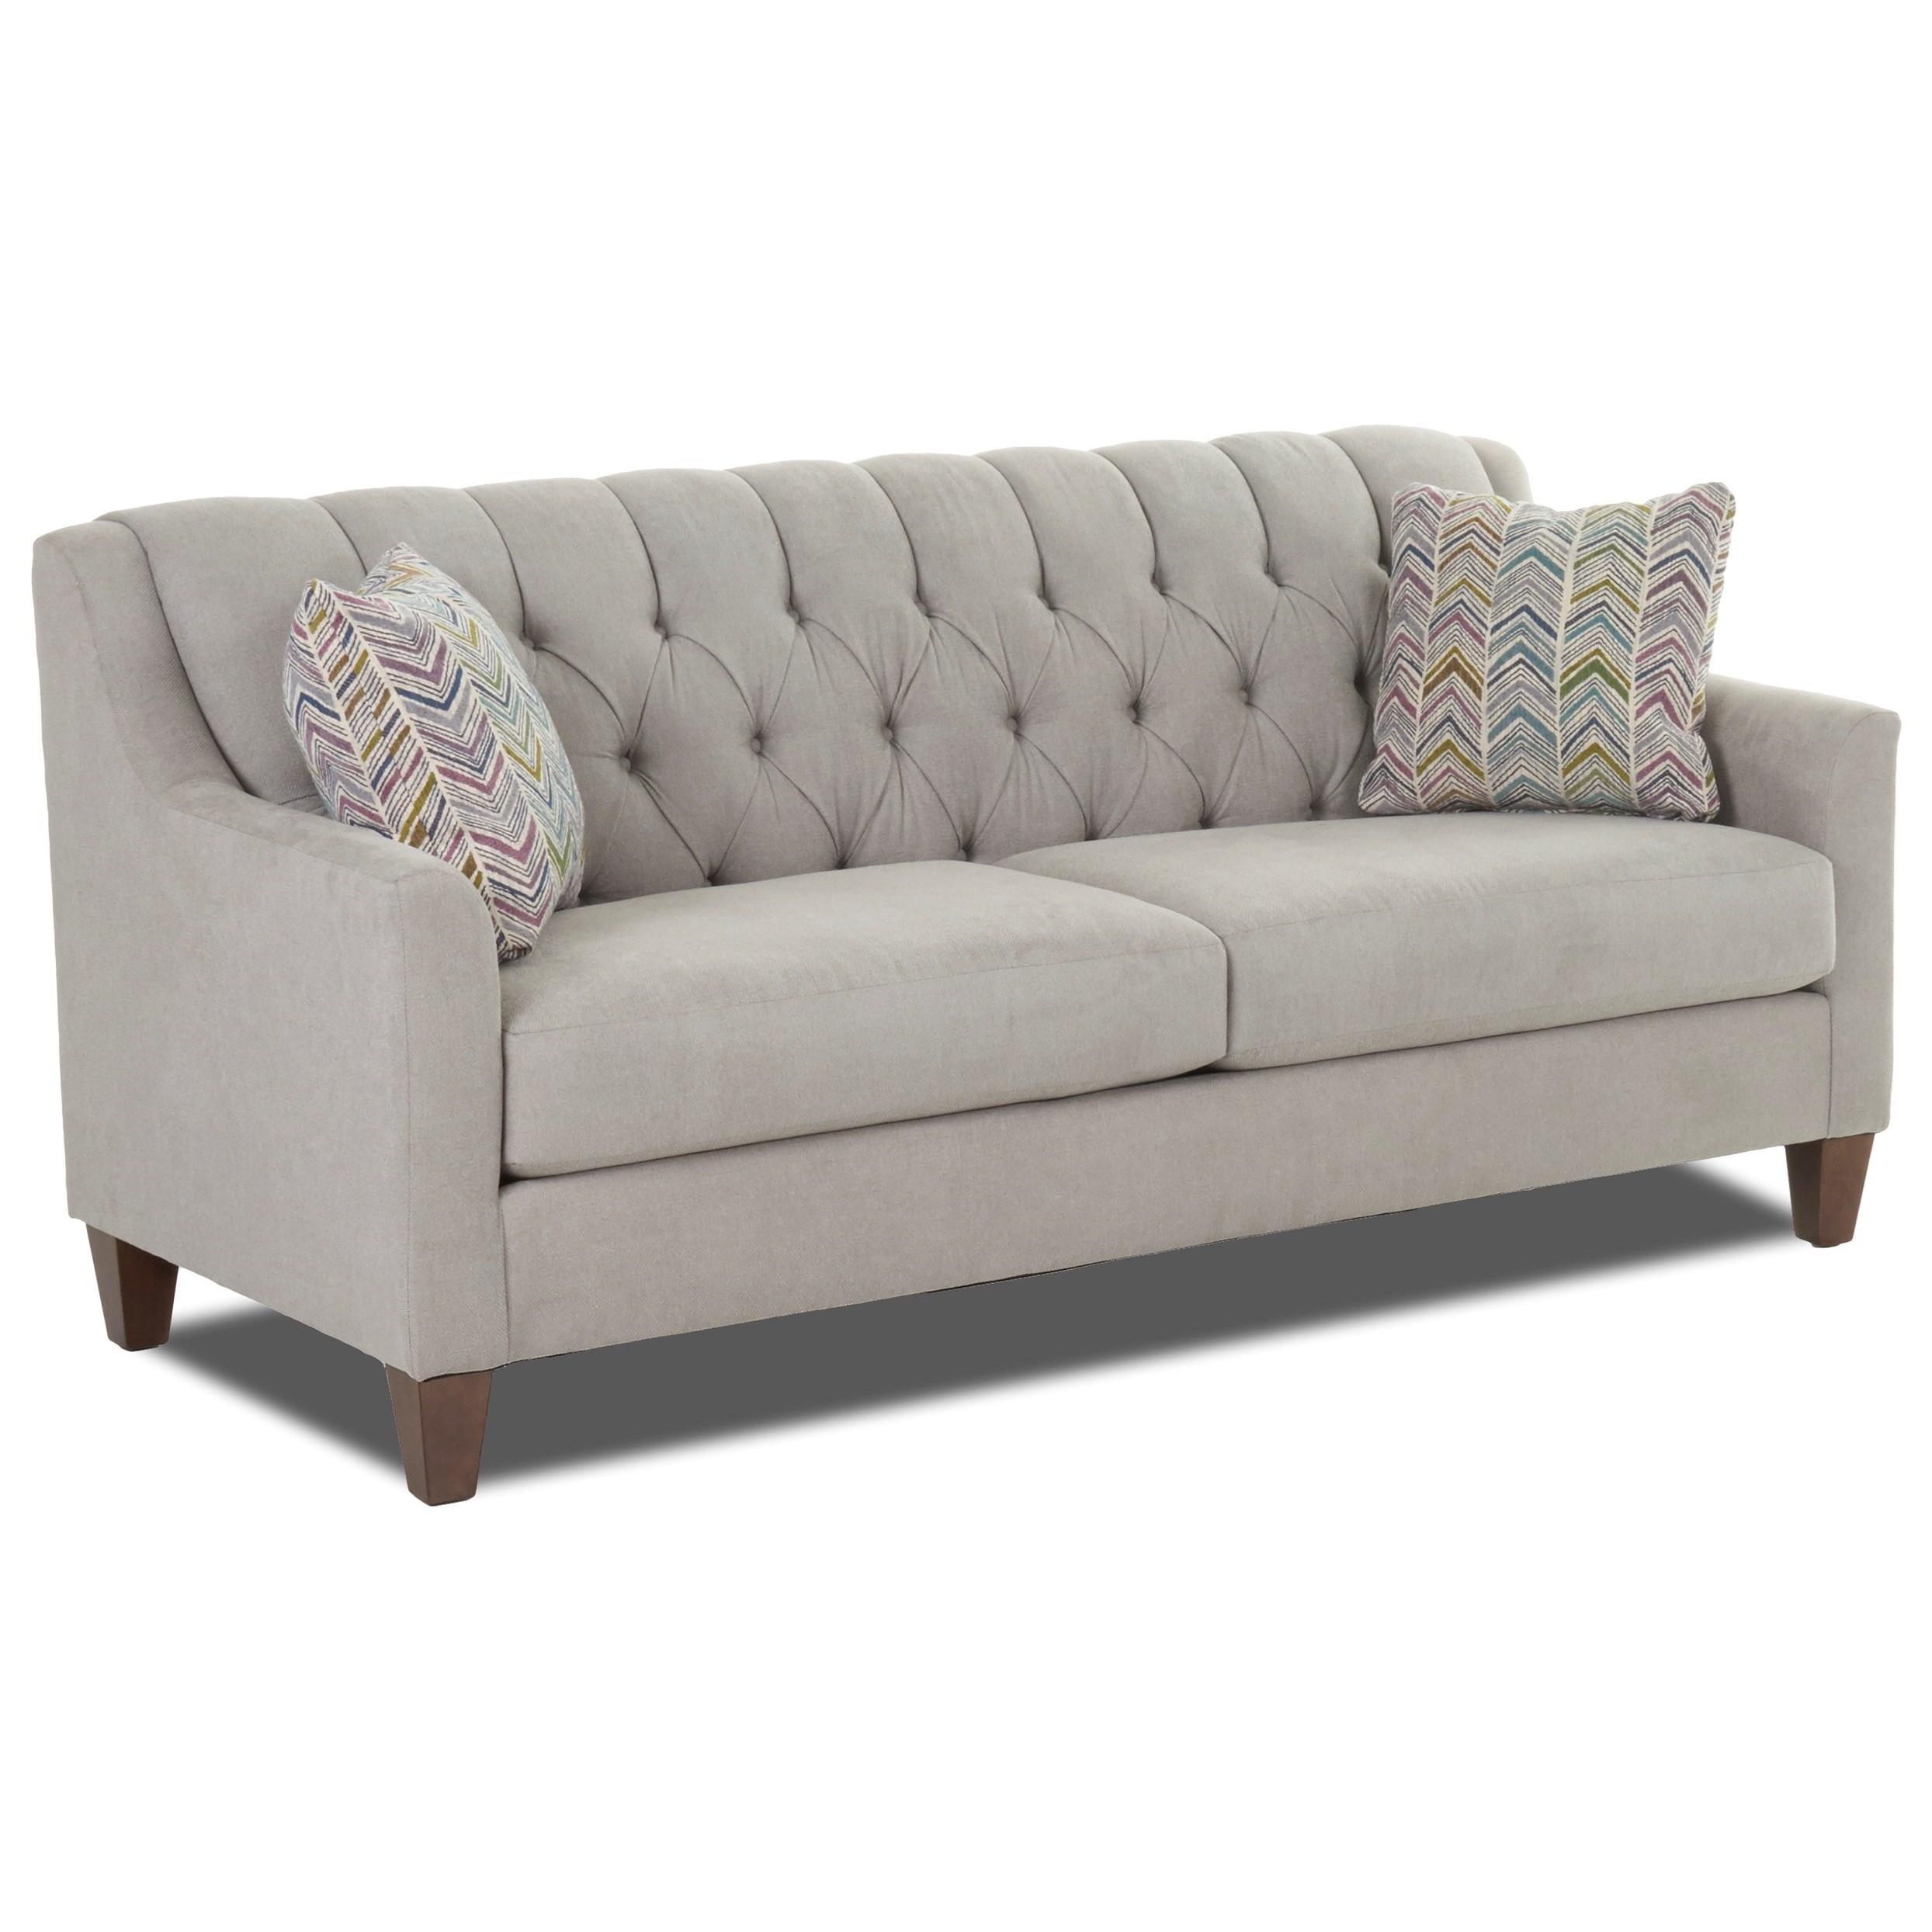 Klaussner Laguna K29500 S Apartment Size Tufted Sofa